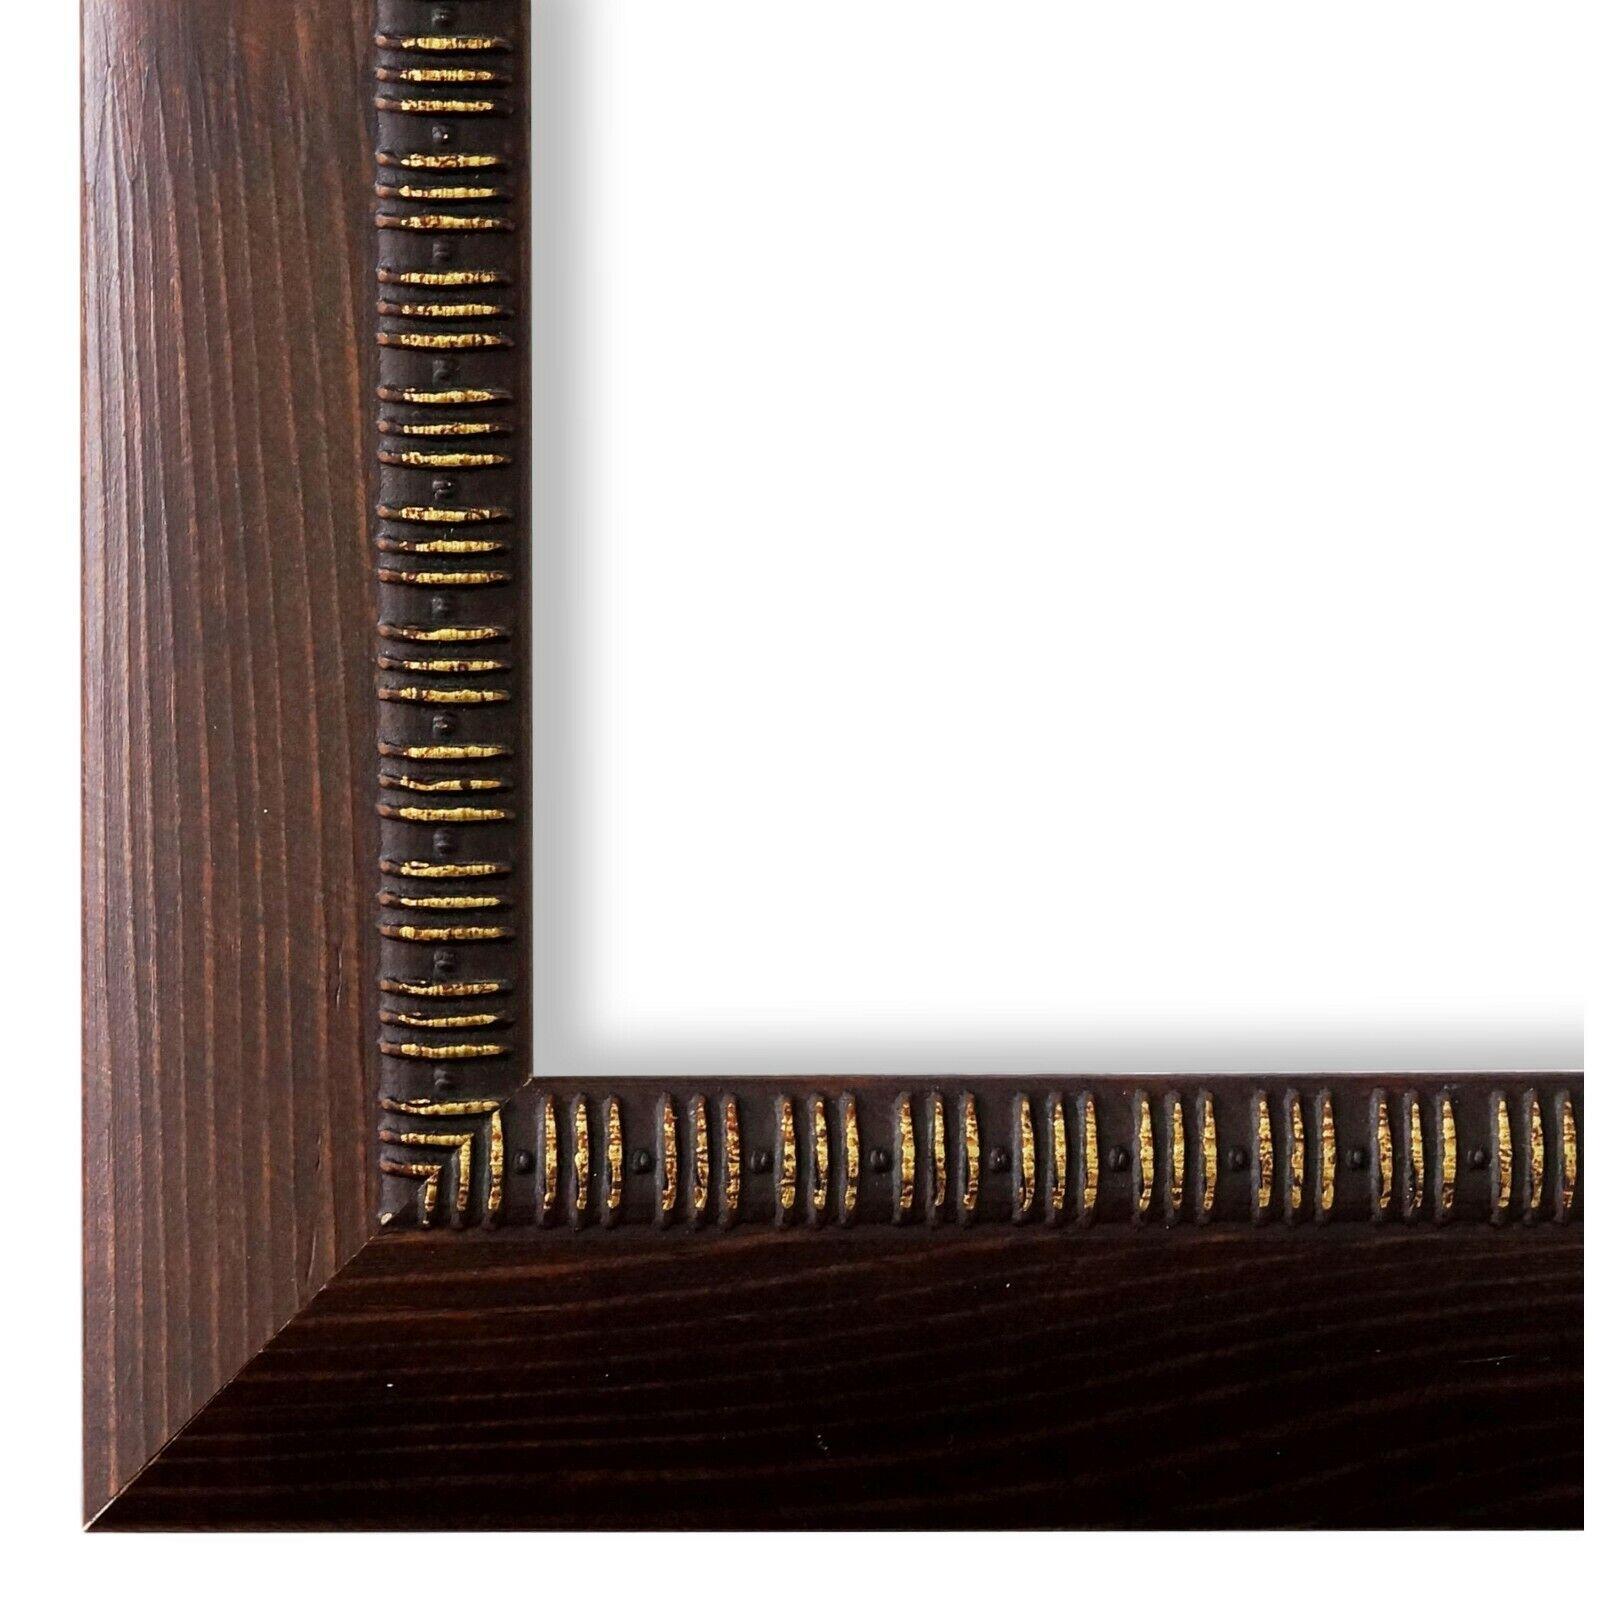 Bilderrahmen Turin Braun - DIN A0 DIN A1 DIN A2 DIN A3 DIN A4 DIN A5